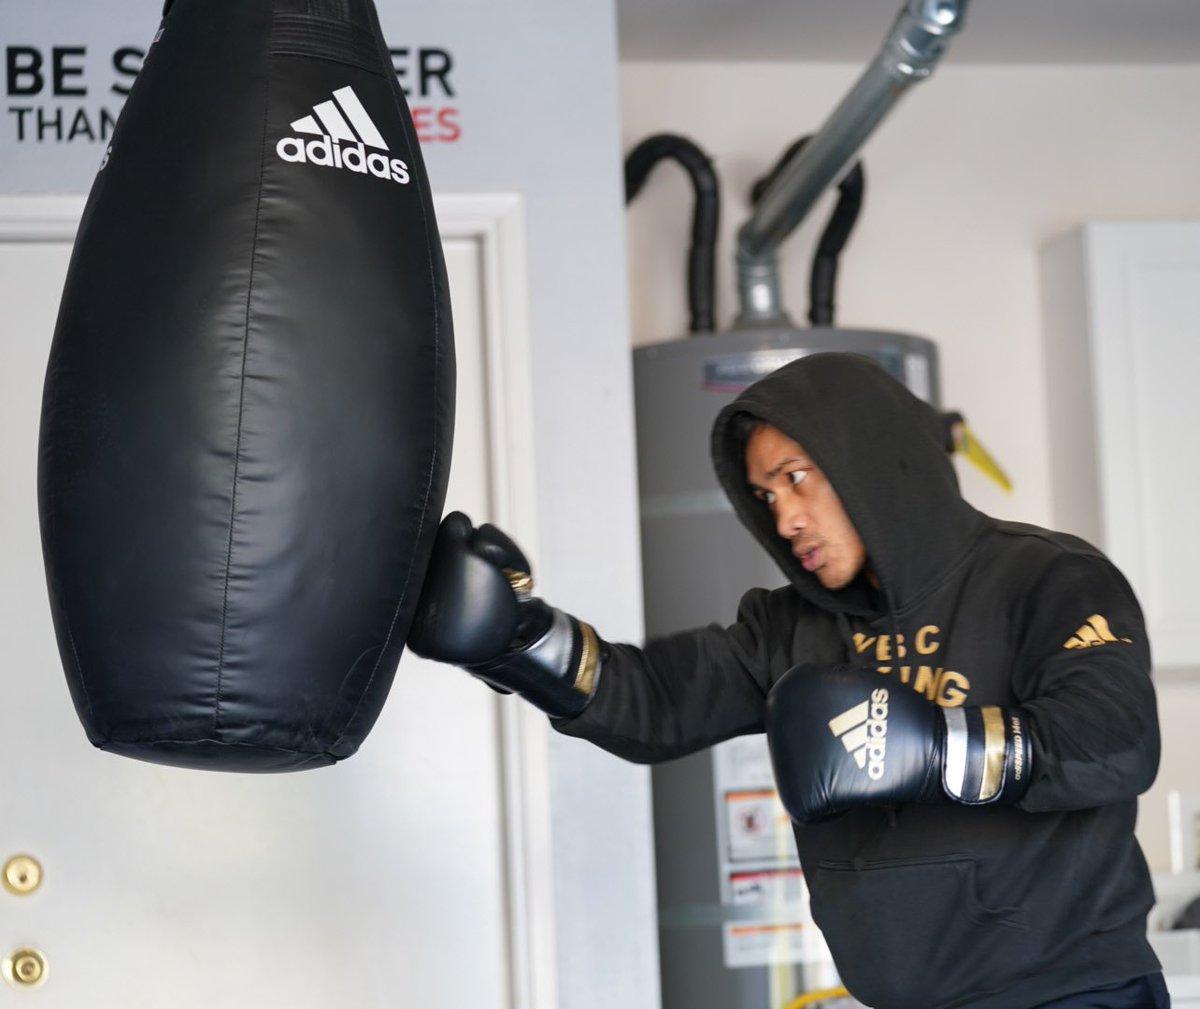 Be stronger than your excuses!  #StayingReady #ReadyForSport #AdidasBoxing #GoldenBoyBoxing   #HomeTeam #LabanParaSaBayan #Boxing #MercitoGesta   @GoldenBoyBoxing @WildCardBoxing1 @cs_adidas @adidas @mrboxingguru @chrisdessalle @DAZNBoxing @ryujin_sports   📷: @NeilMacasadia